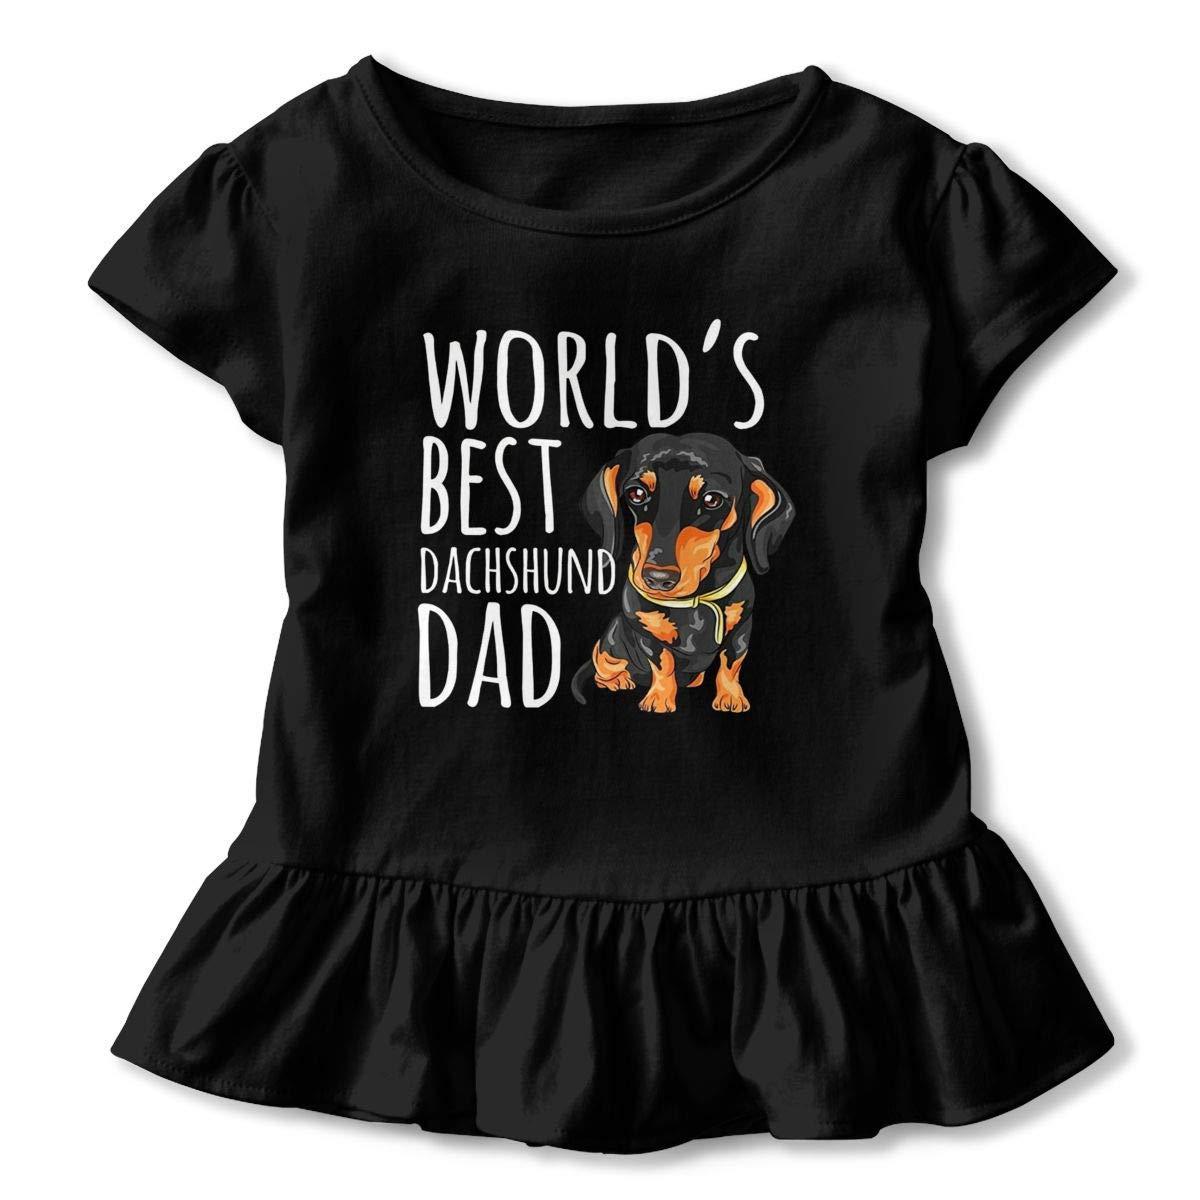 lu fangfangc World Best DAD T-Shirt Kids Flounced T Shirts Soft Tee Shirts for 2-6T Kids Girls